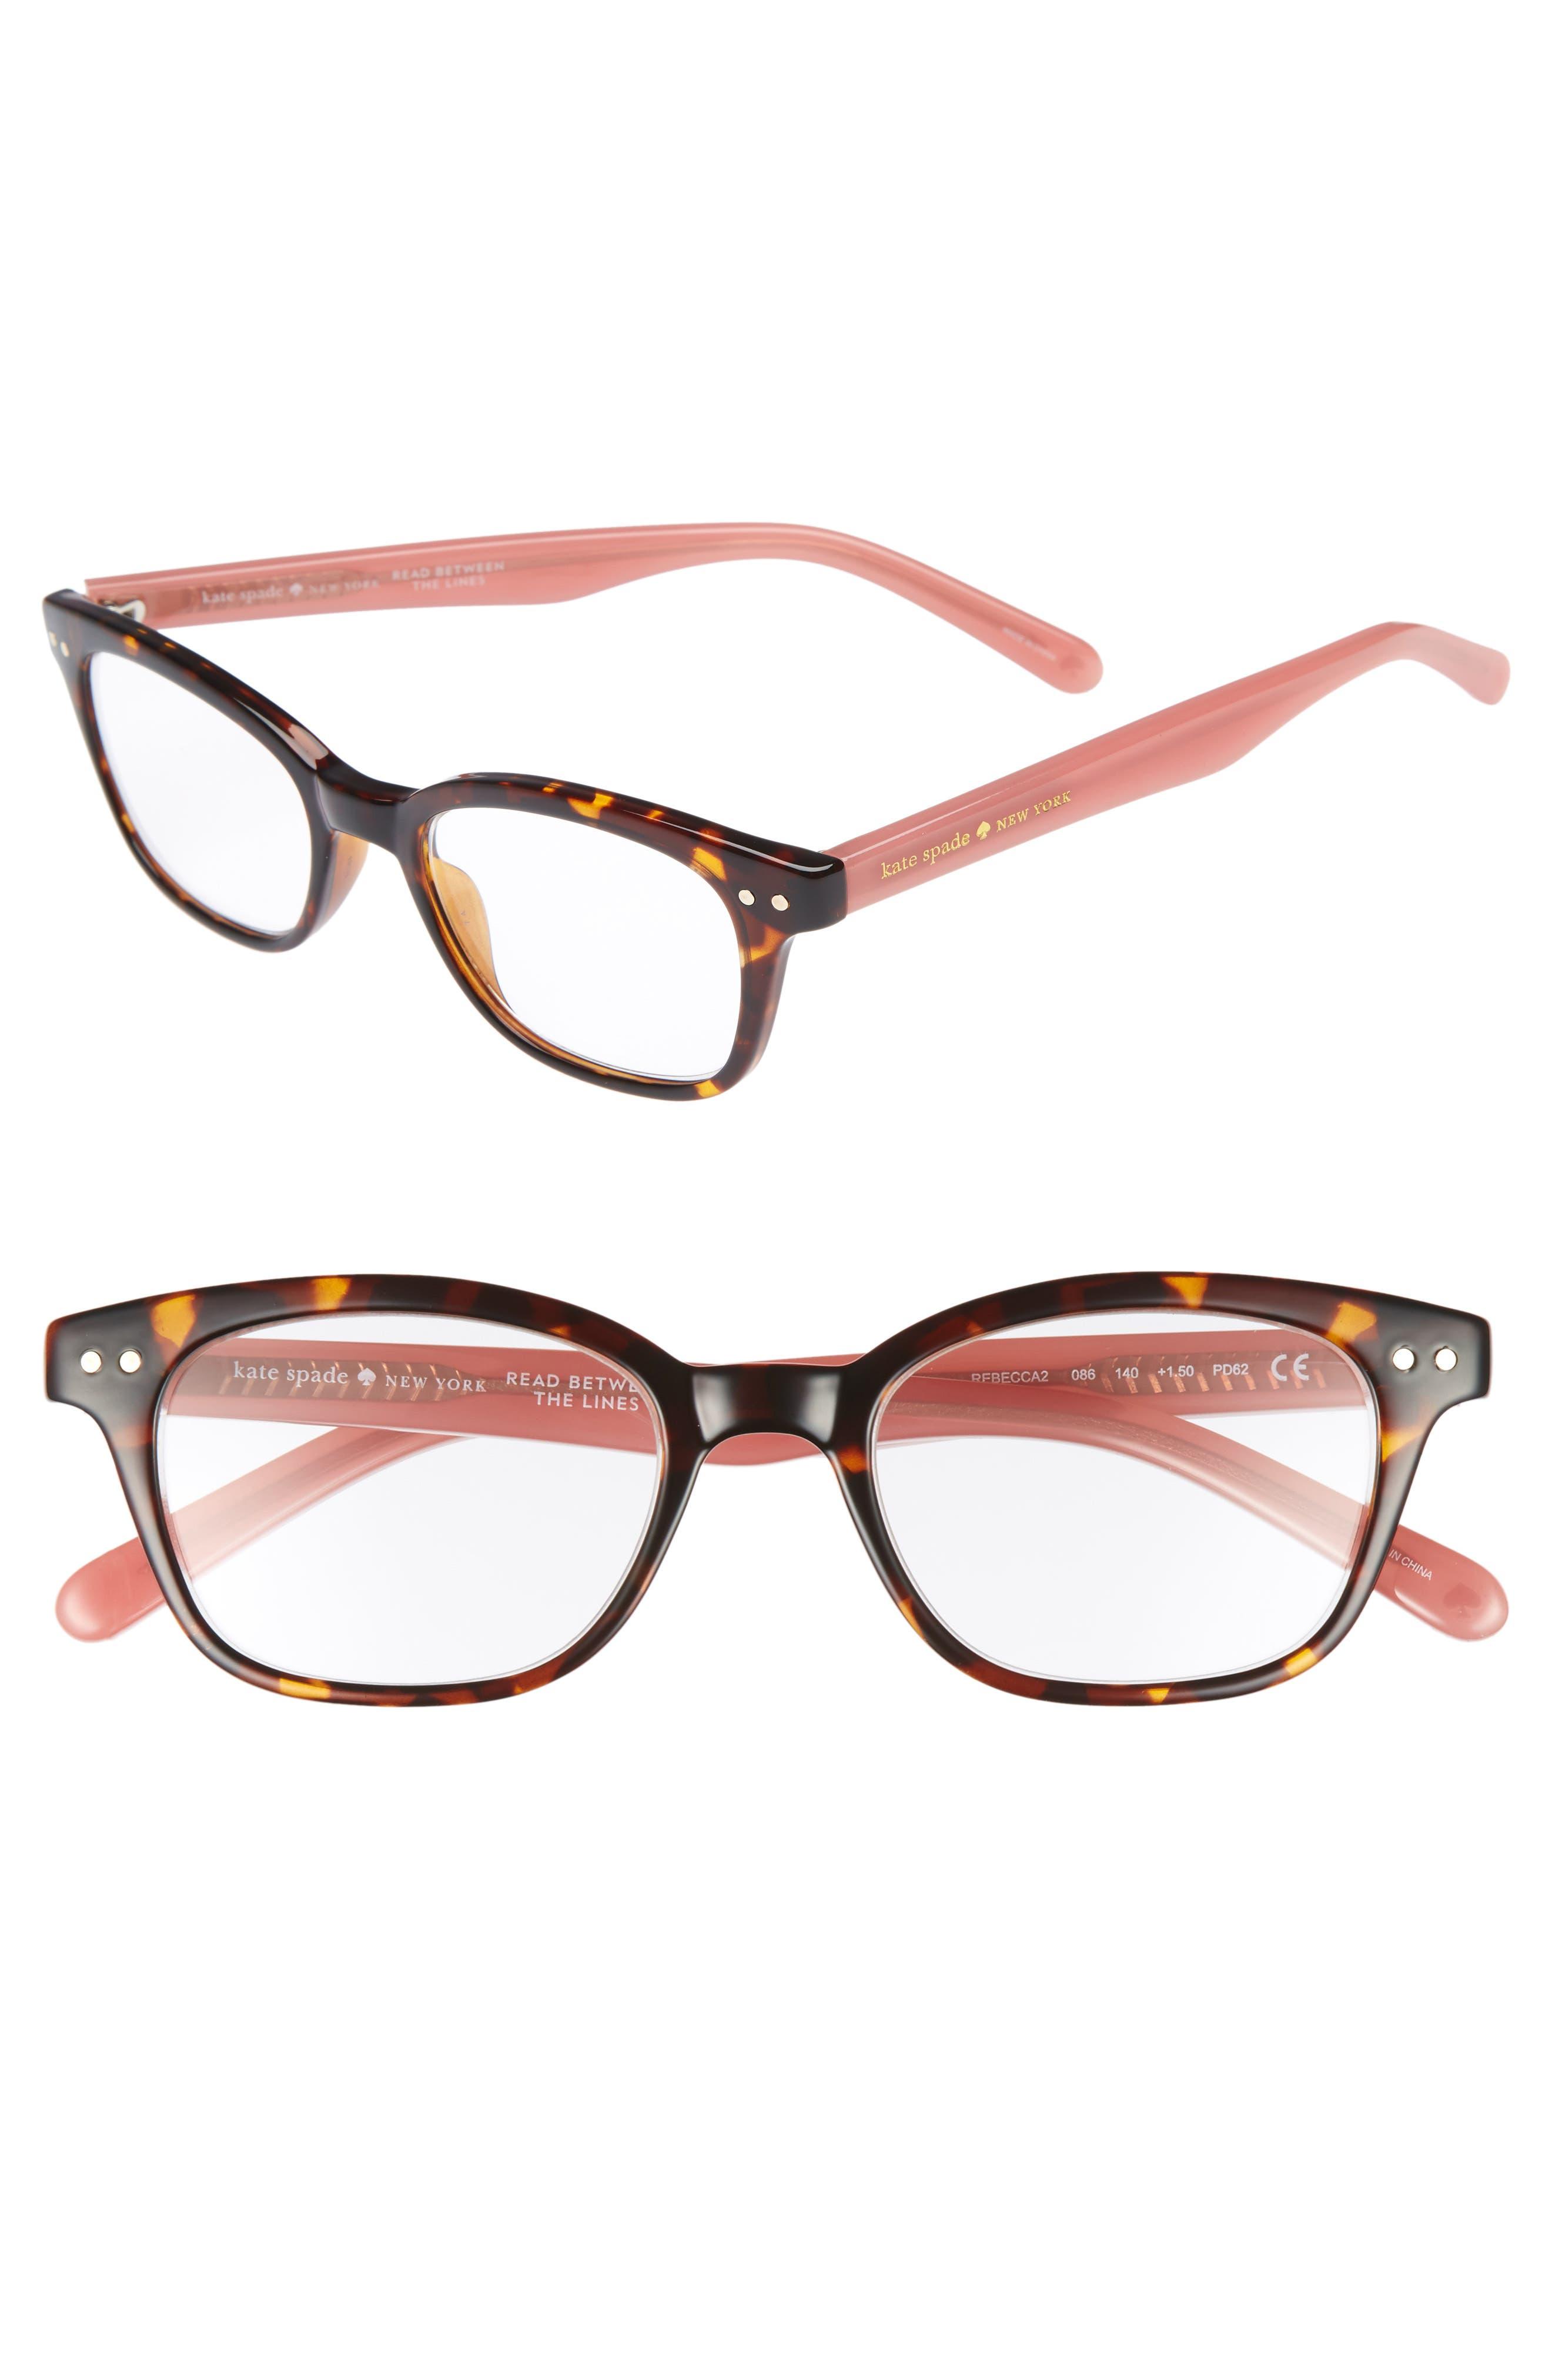 Main Image - kate spade new york rebecca 47mm reading glasses